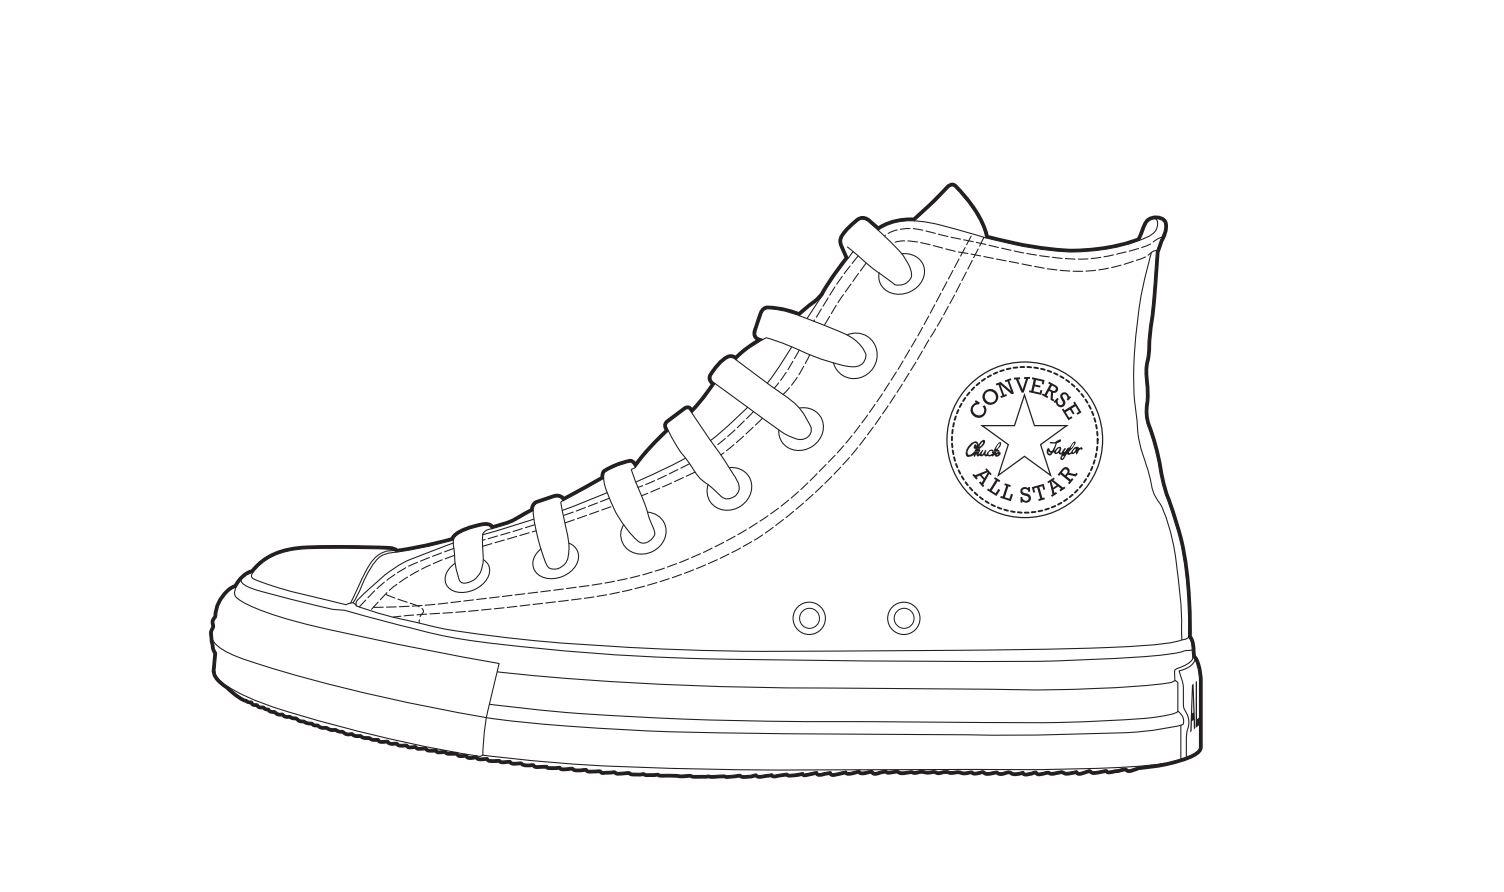 1504x892 Sneaker Art Prize Cream The Innovation Exchange